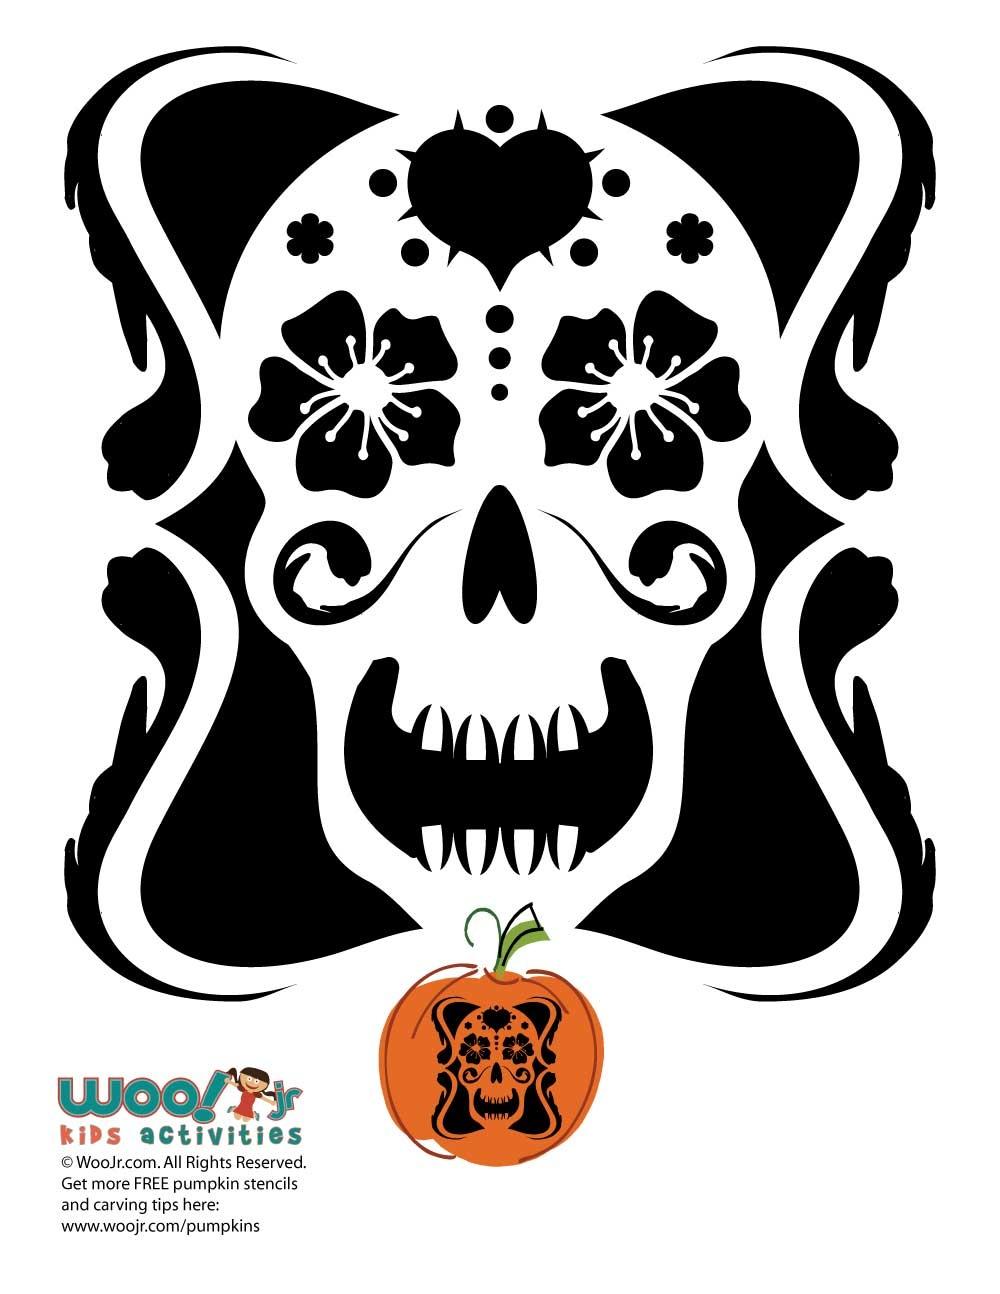 Day Of The Dead Pumpkin Carving Stencils   Woo! Jr. Kids Activities - Free Printable Sugar Skull Pumpkin Stencils